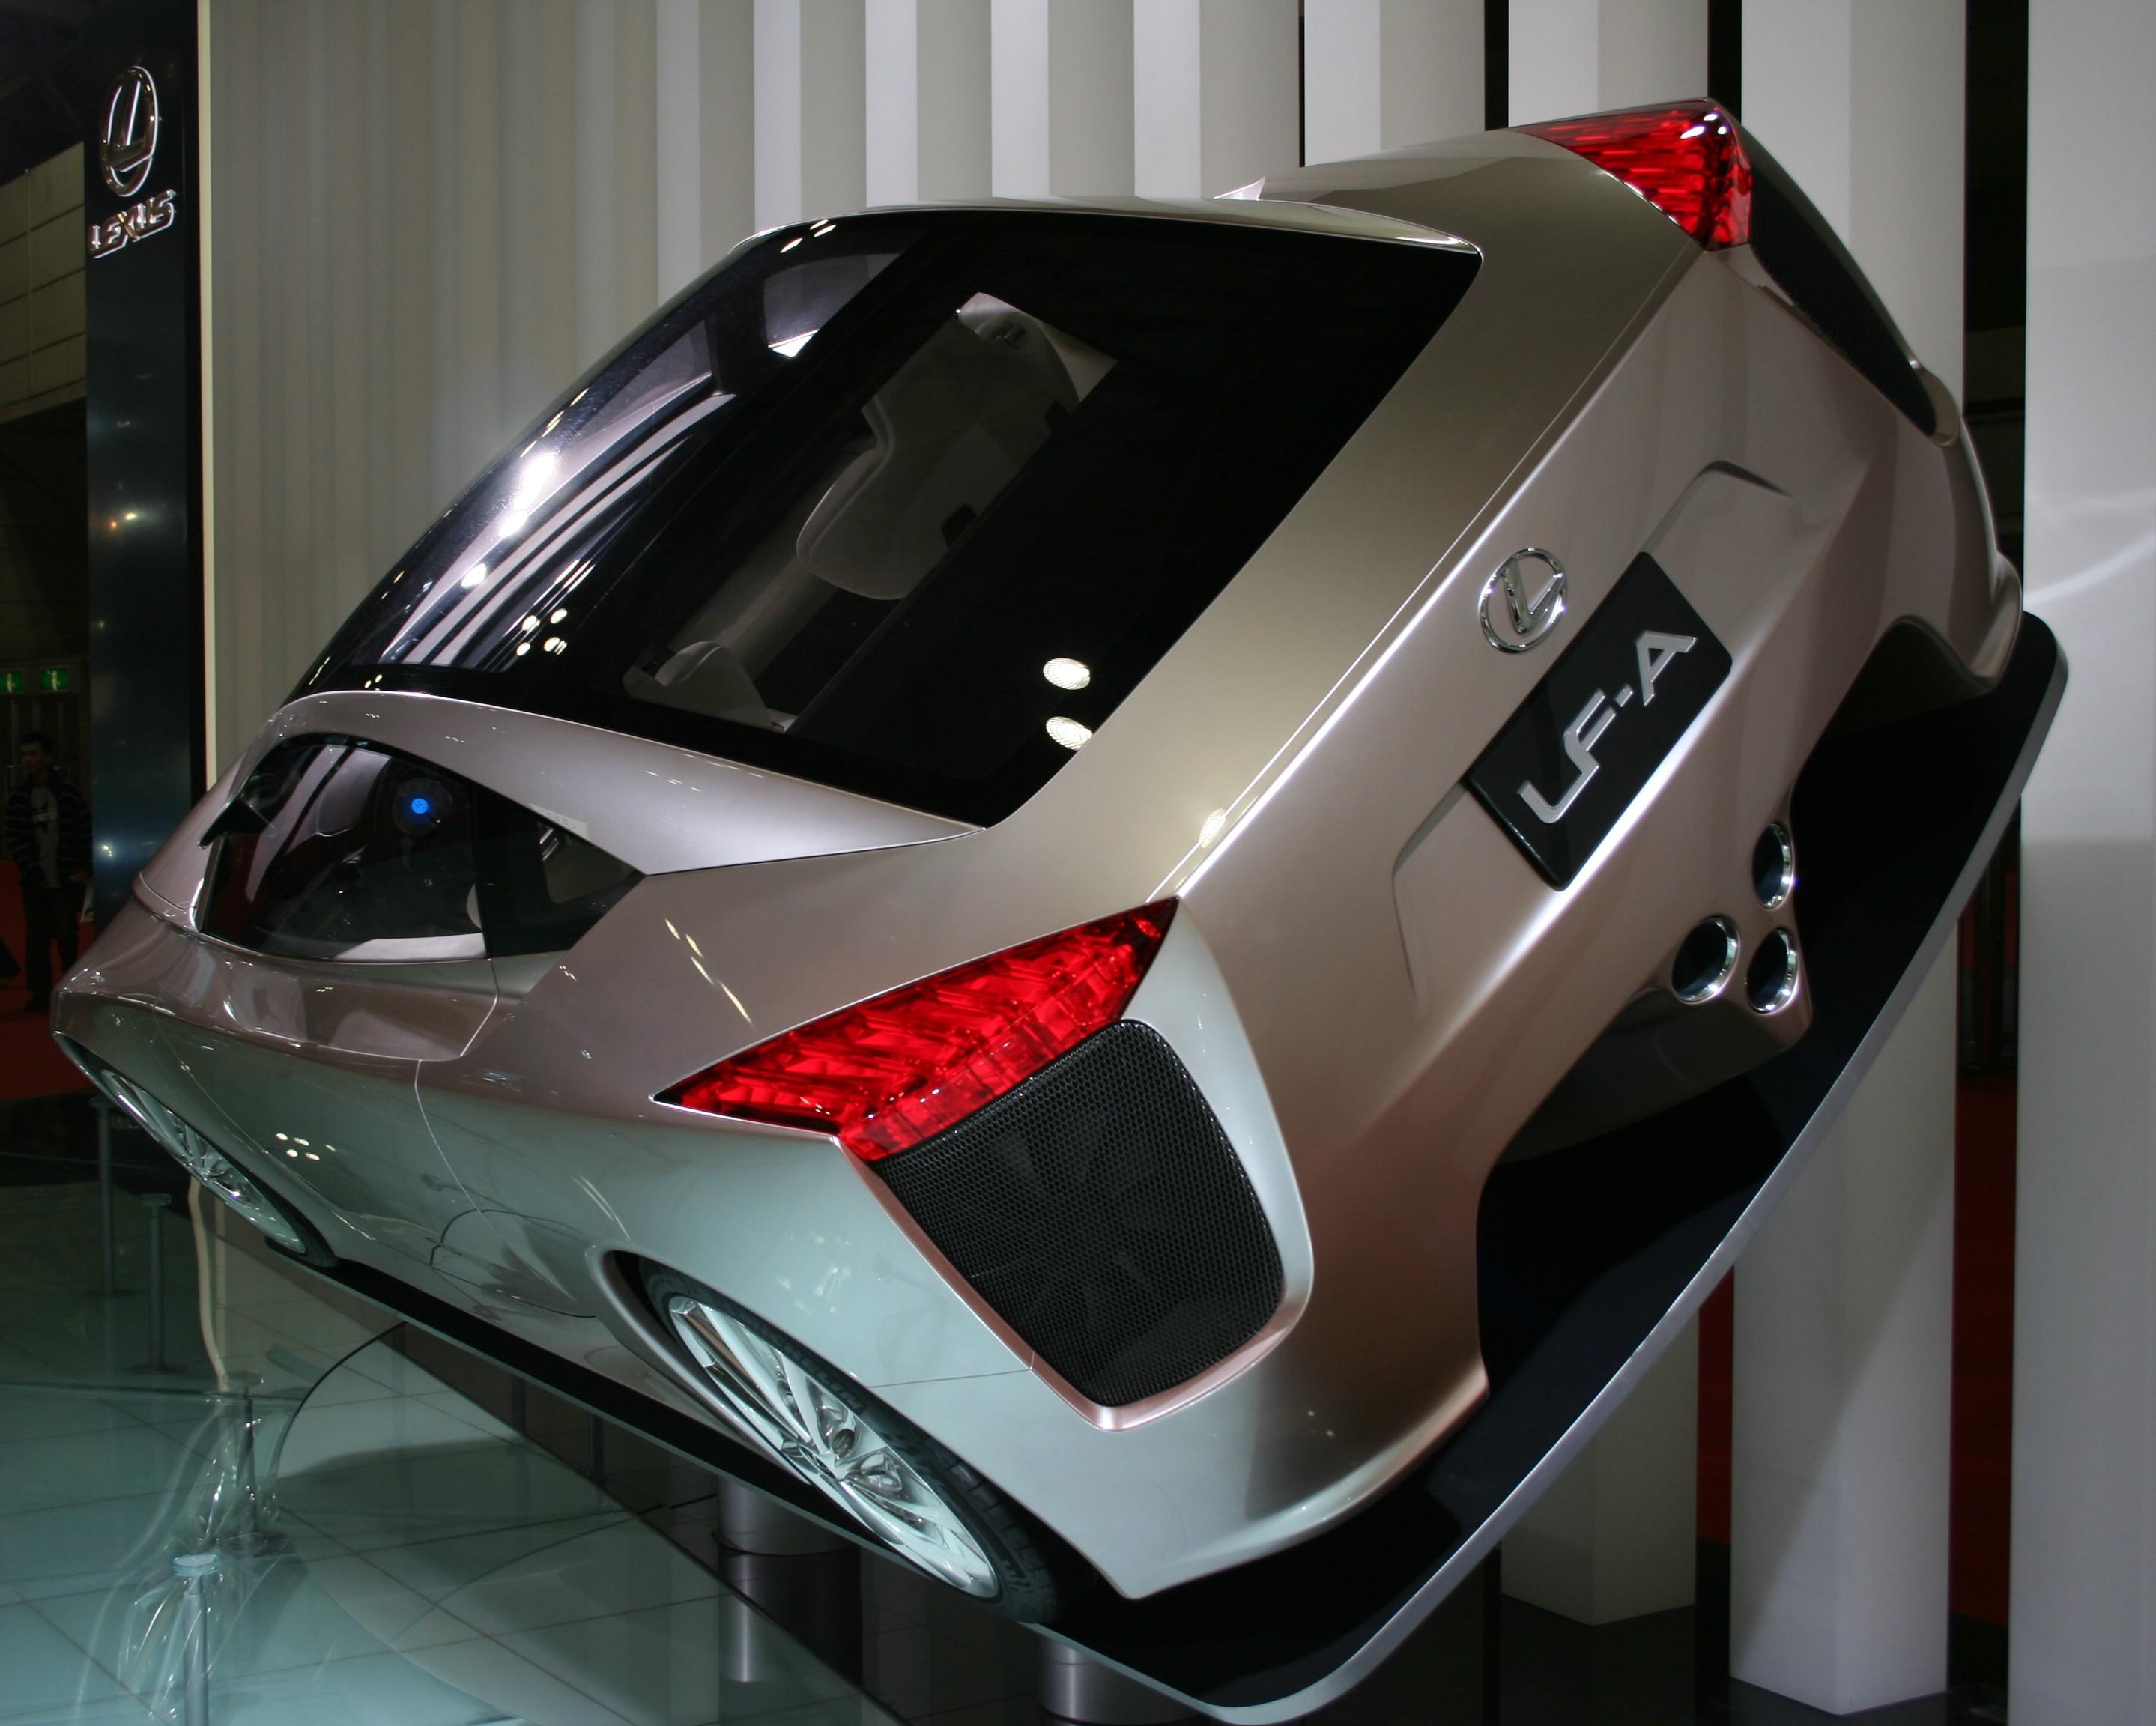 http://upload.wikimedia.org/wikipedia/commons/4/44/Lexus_LF-A_2005_TMS_2.jpg